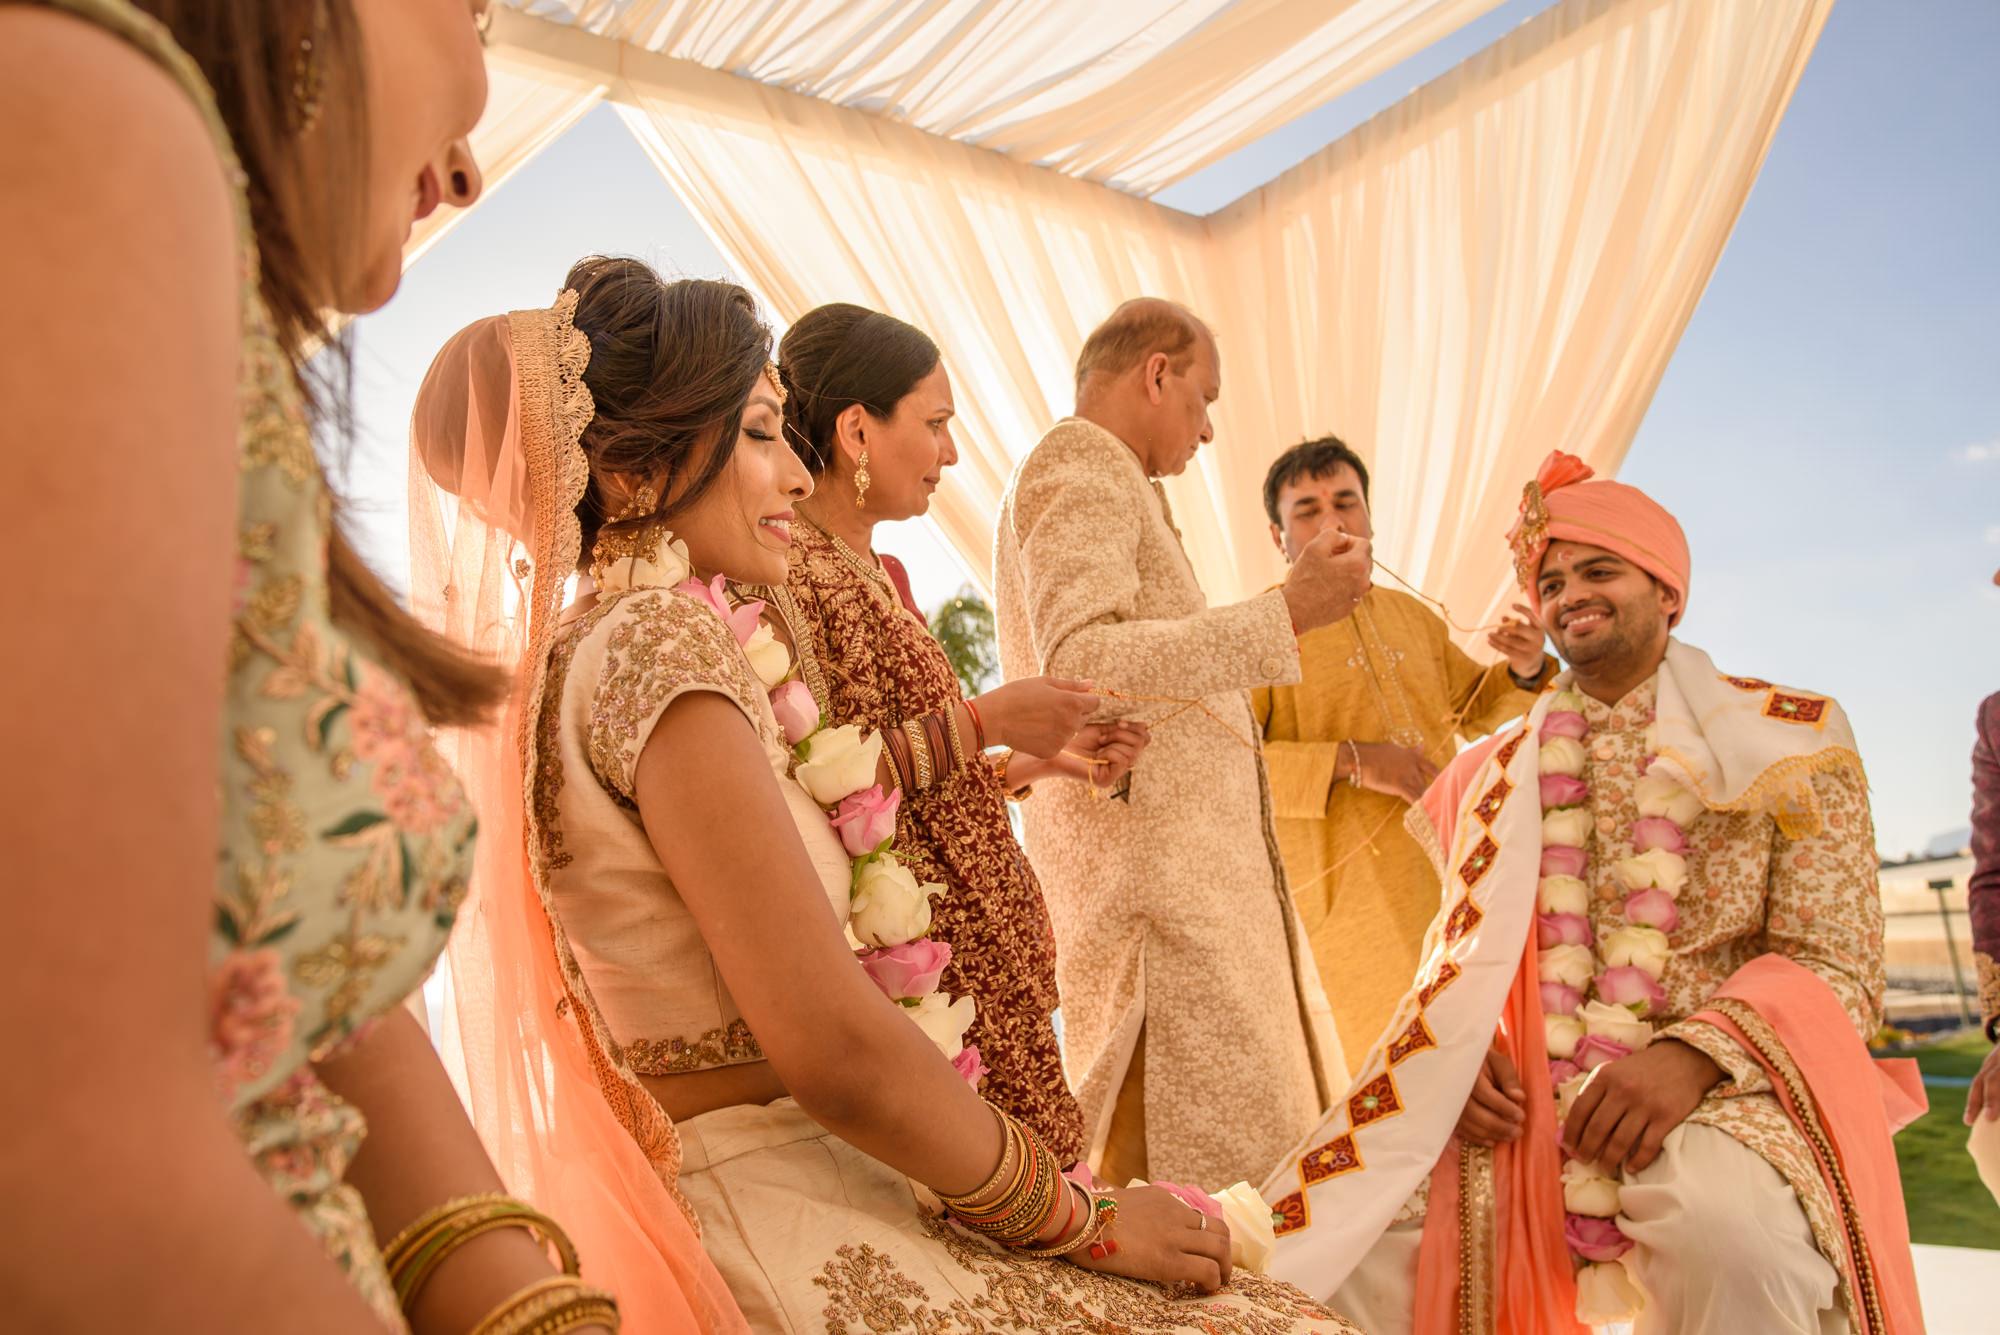 satnam photography wedding indian asian hindu destination wedding photographer tenerife ritz carlton abama-159.jpg